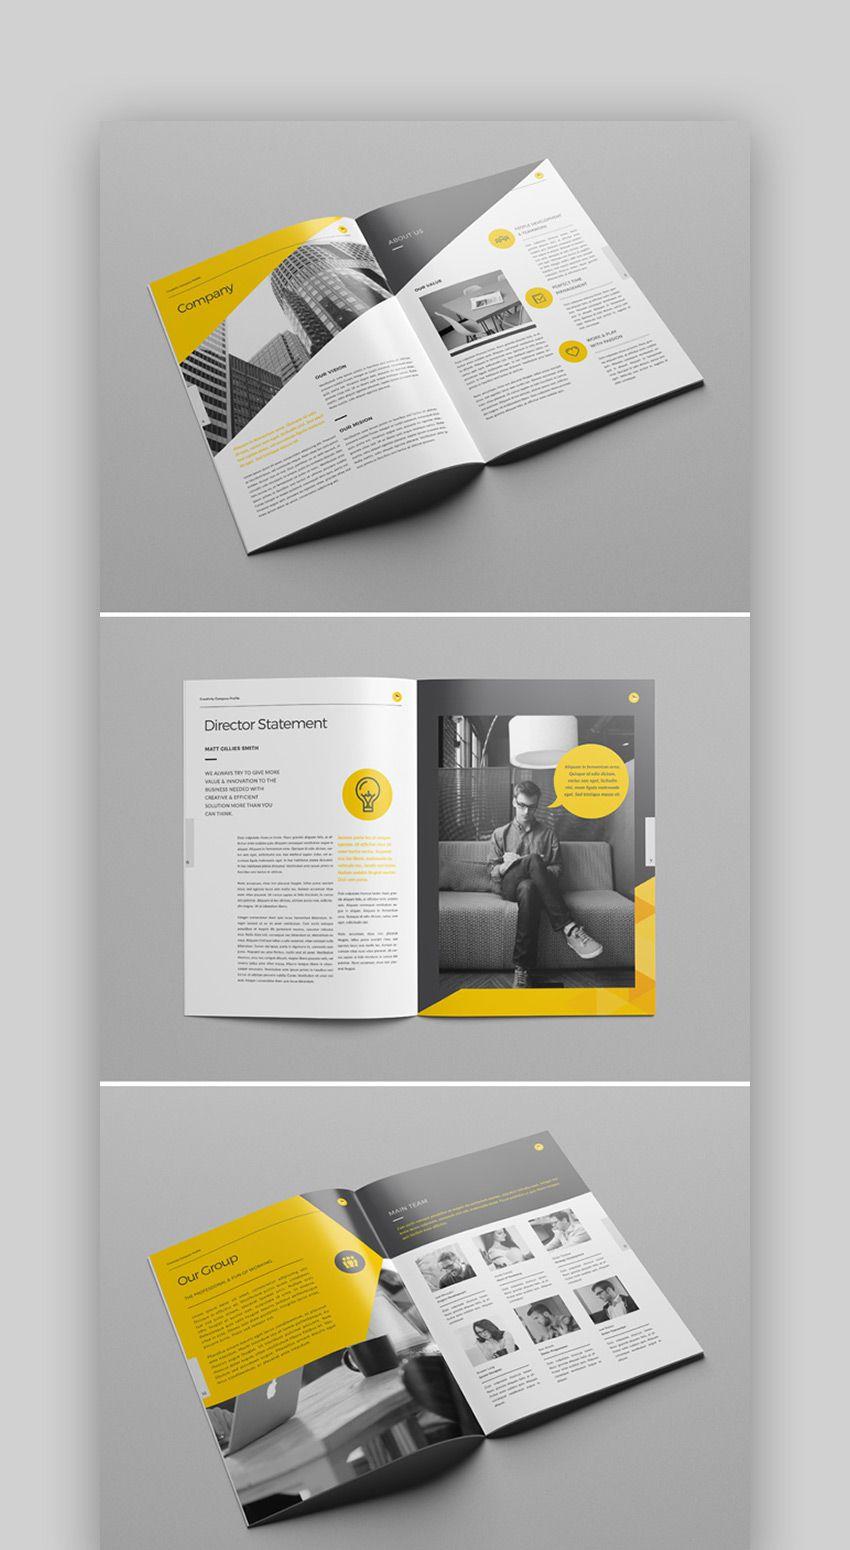 009 Imposing Adobe Indesign Brochure Template Free Download Design Full